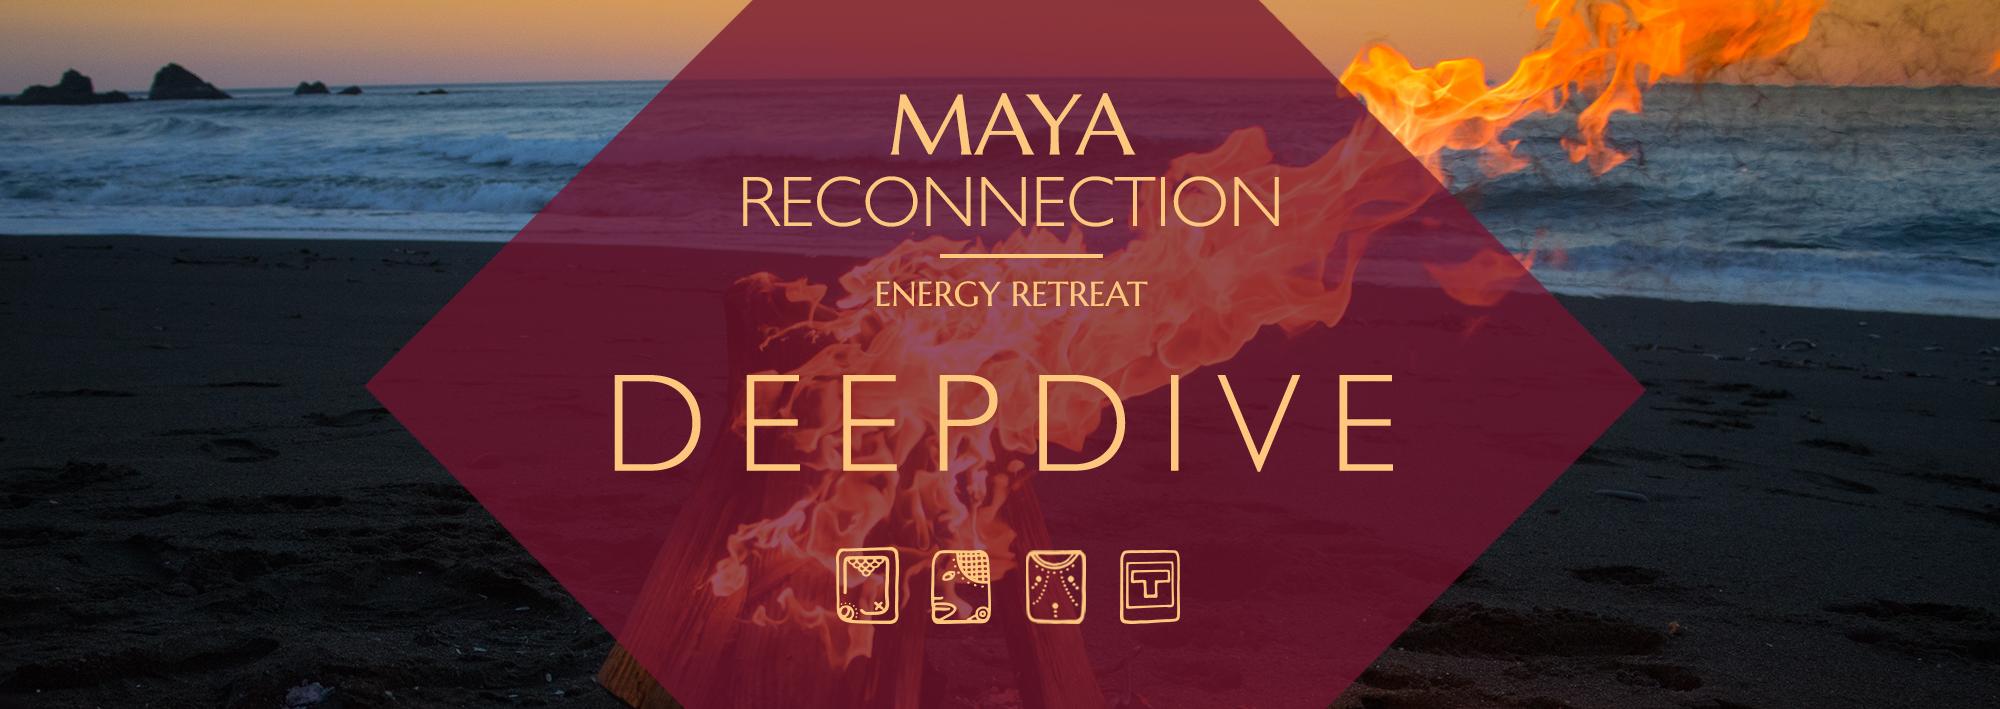 Slider_maya-reconnection_retreat_deepdive